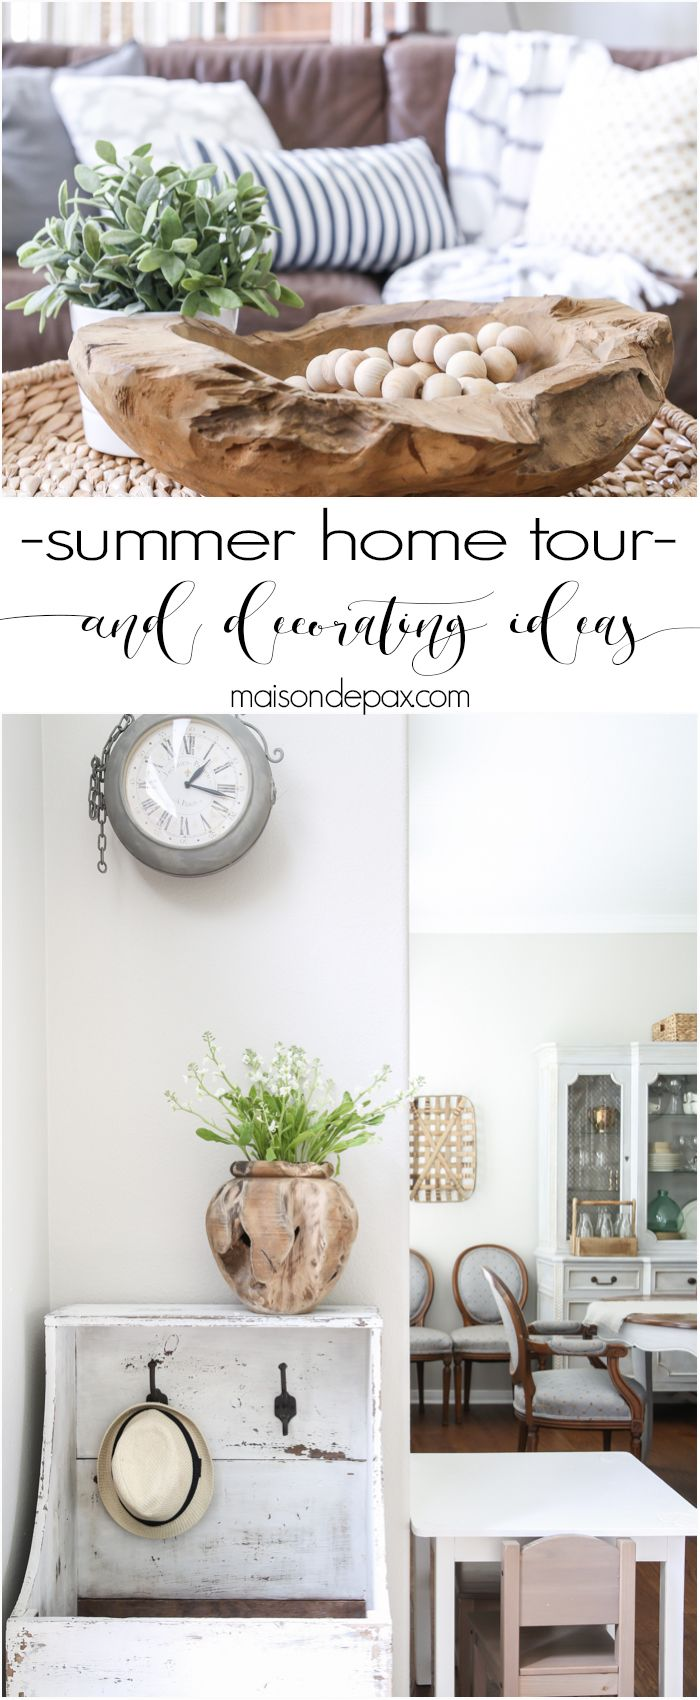 Summer decorating ideas home tour decor it pinterest home